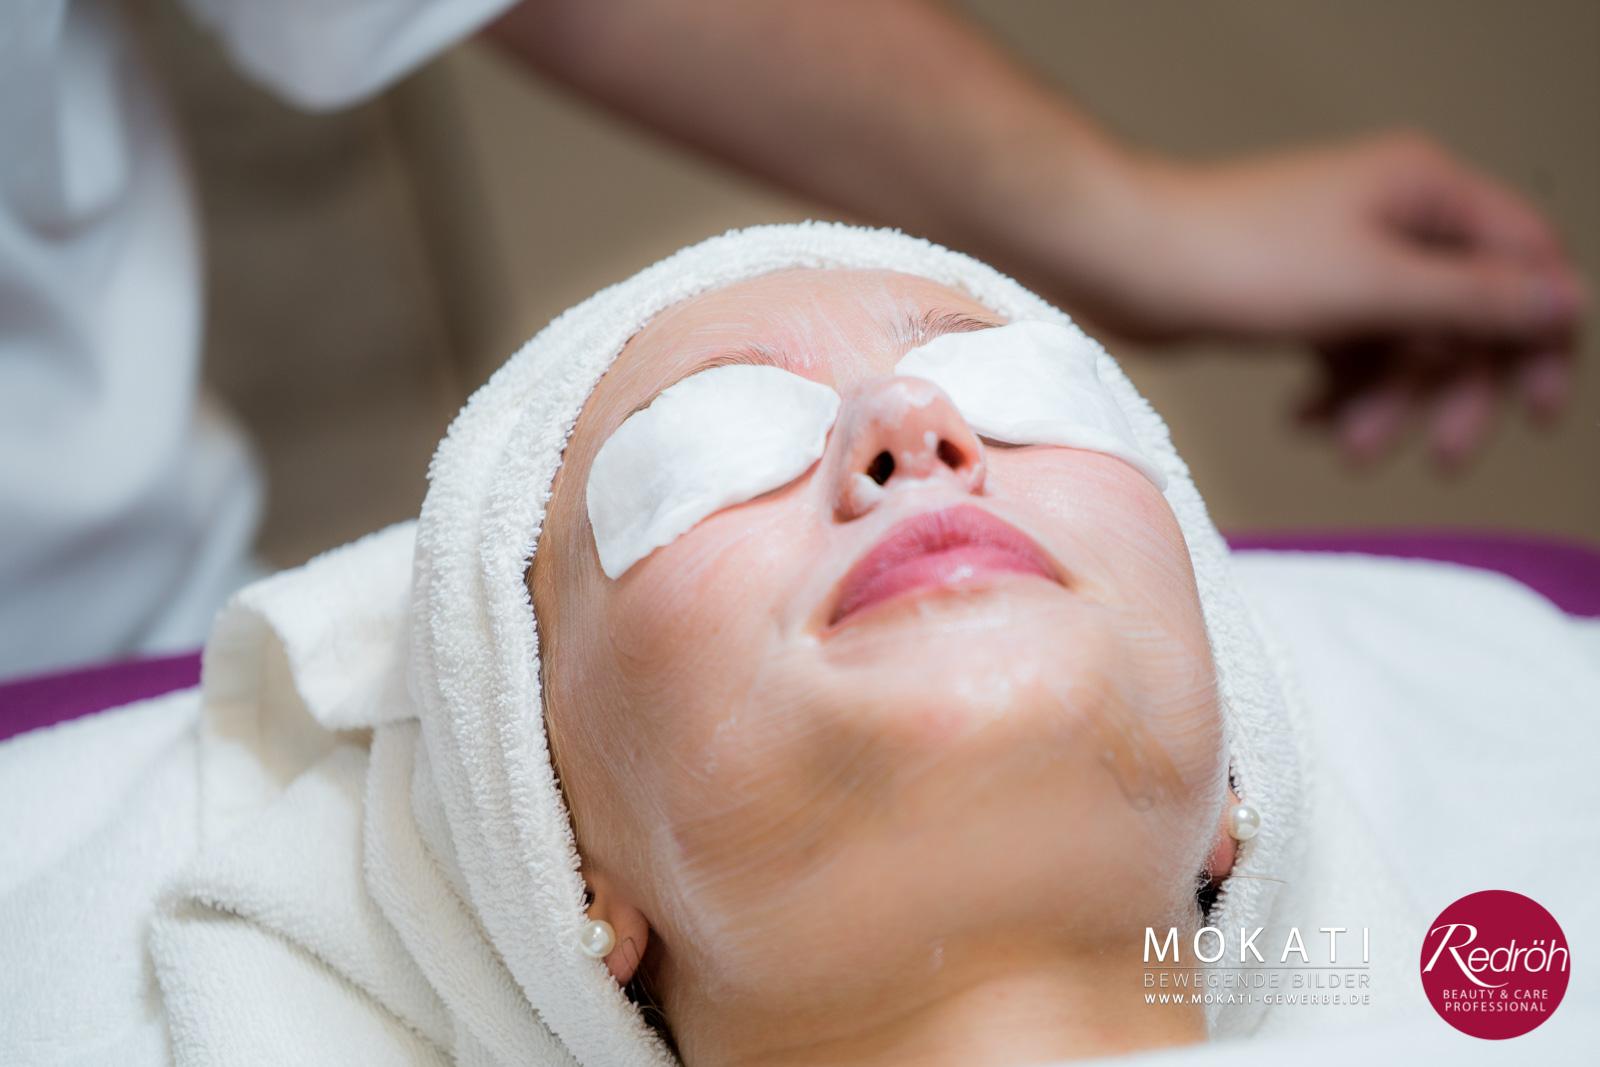 Redröh - Beauty & Care professional Gesichtspflege